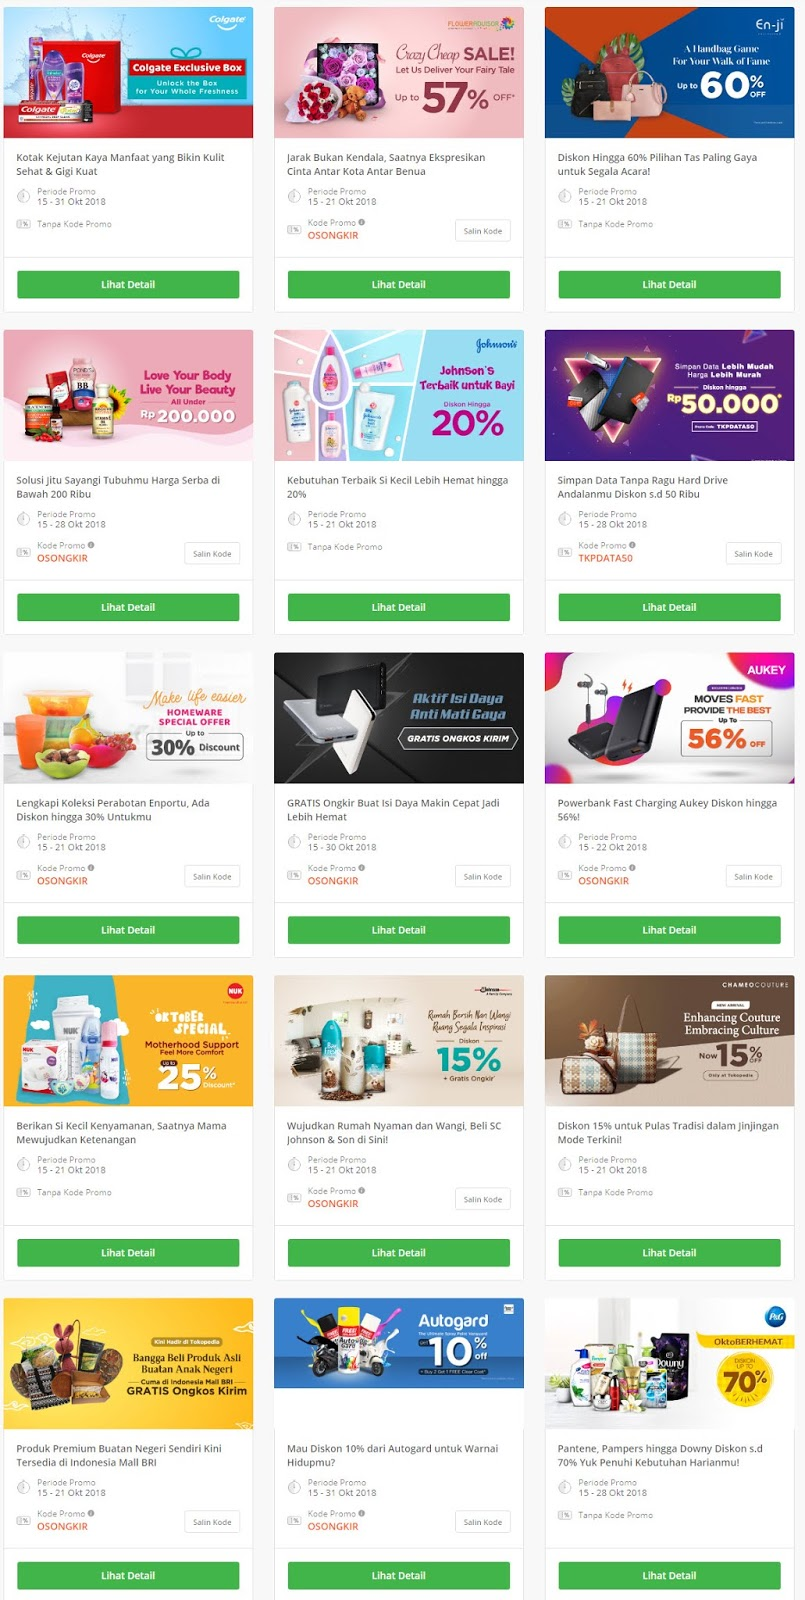 Tokopedia - Promo Lengkap Diskon Multi Produk Periode 15 - 21 Okt 2018